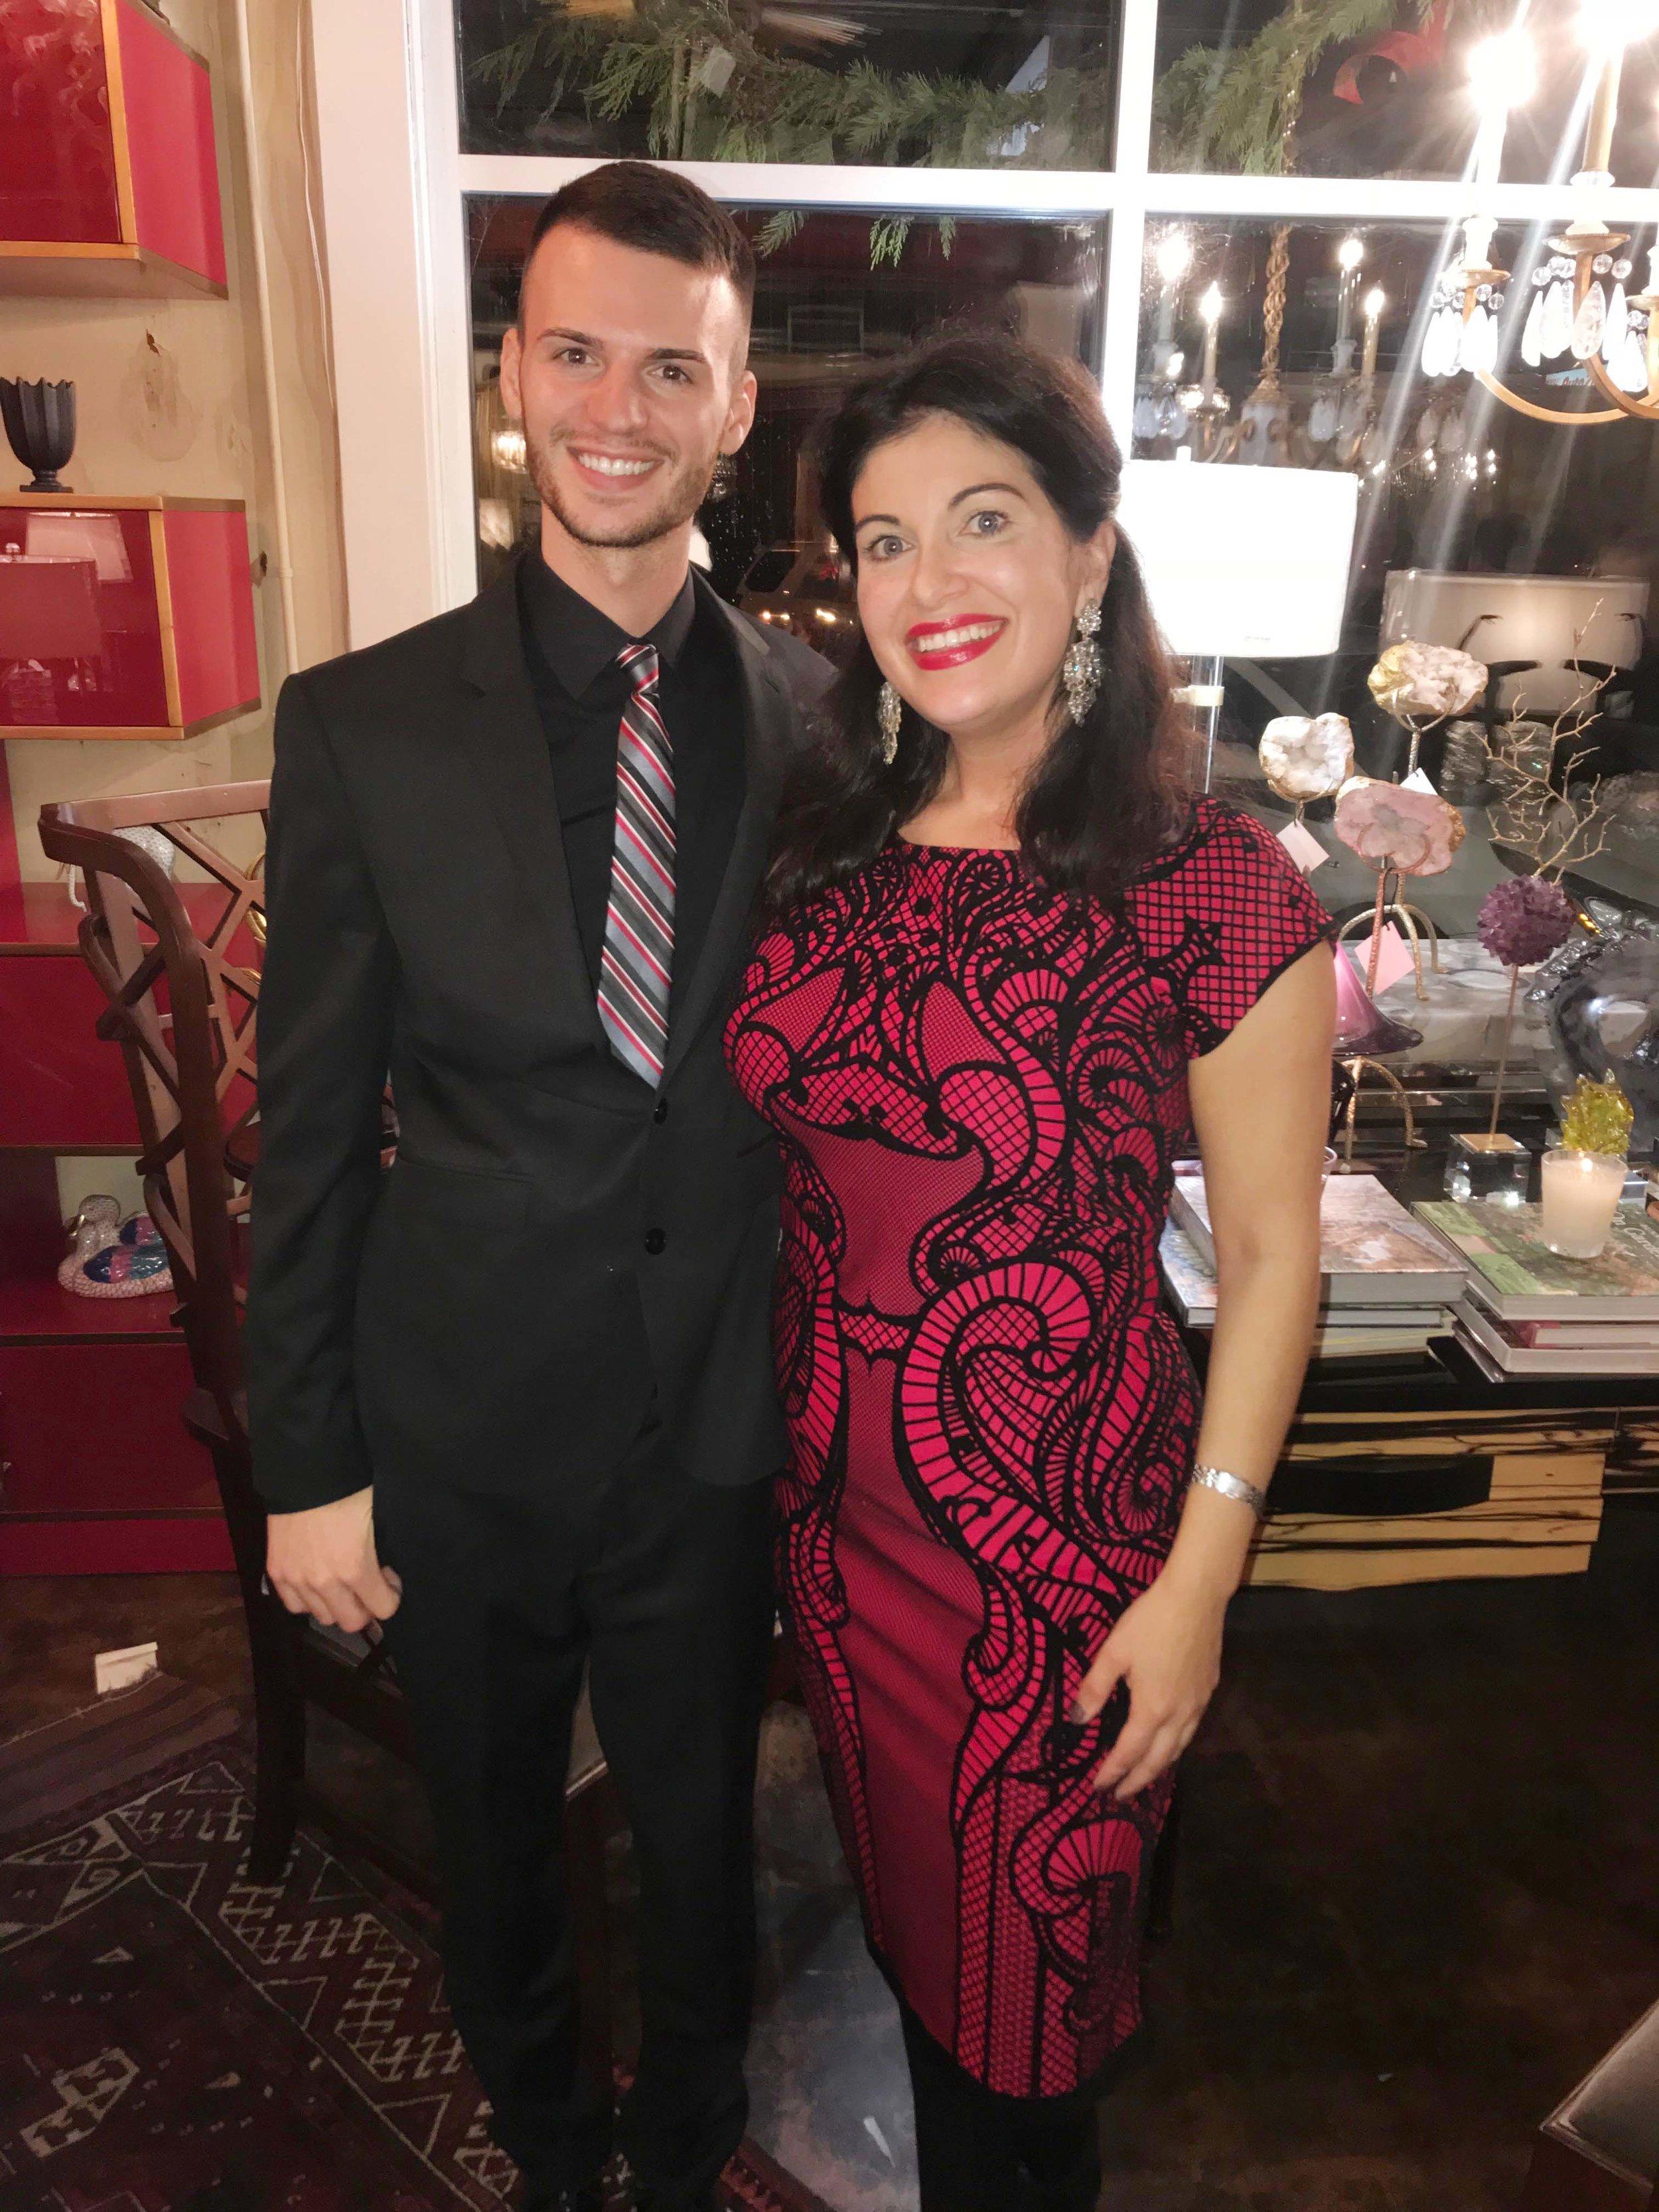 Caleb Scott and Erica Cain